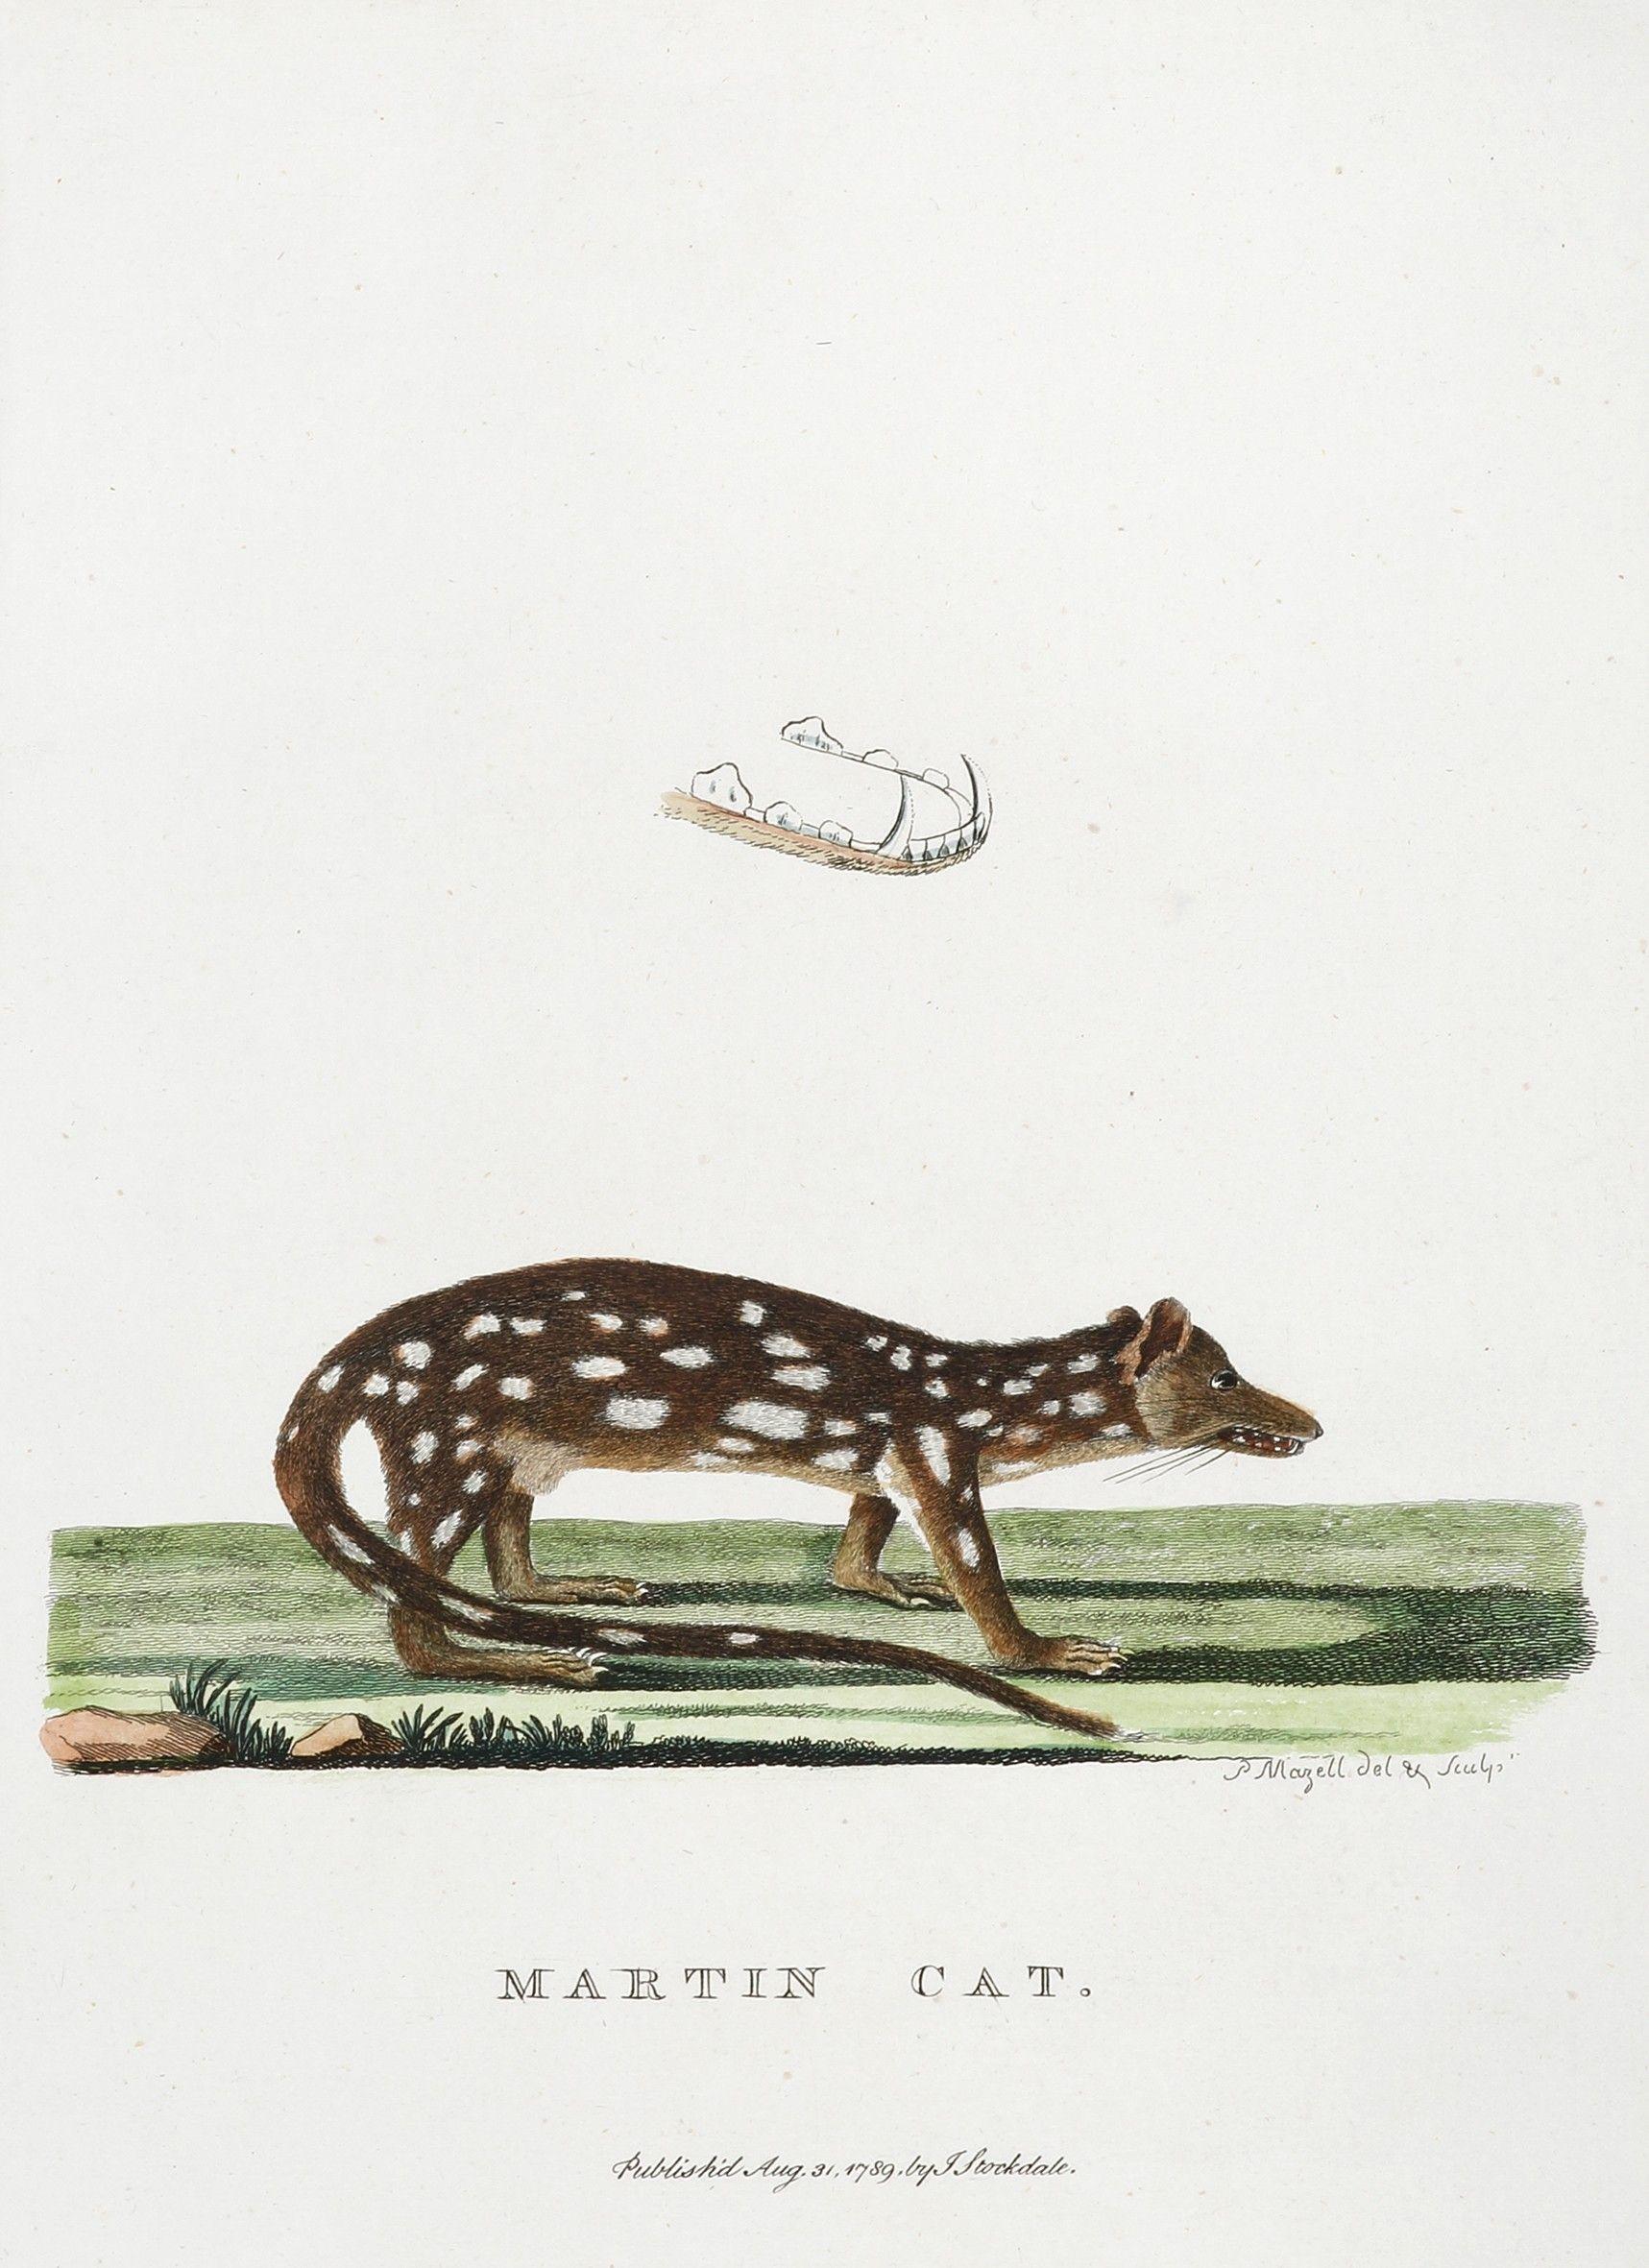 Martin Cat Cats, Australian animals, Botanical illustration